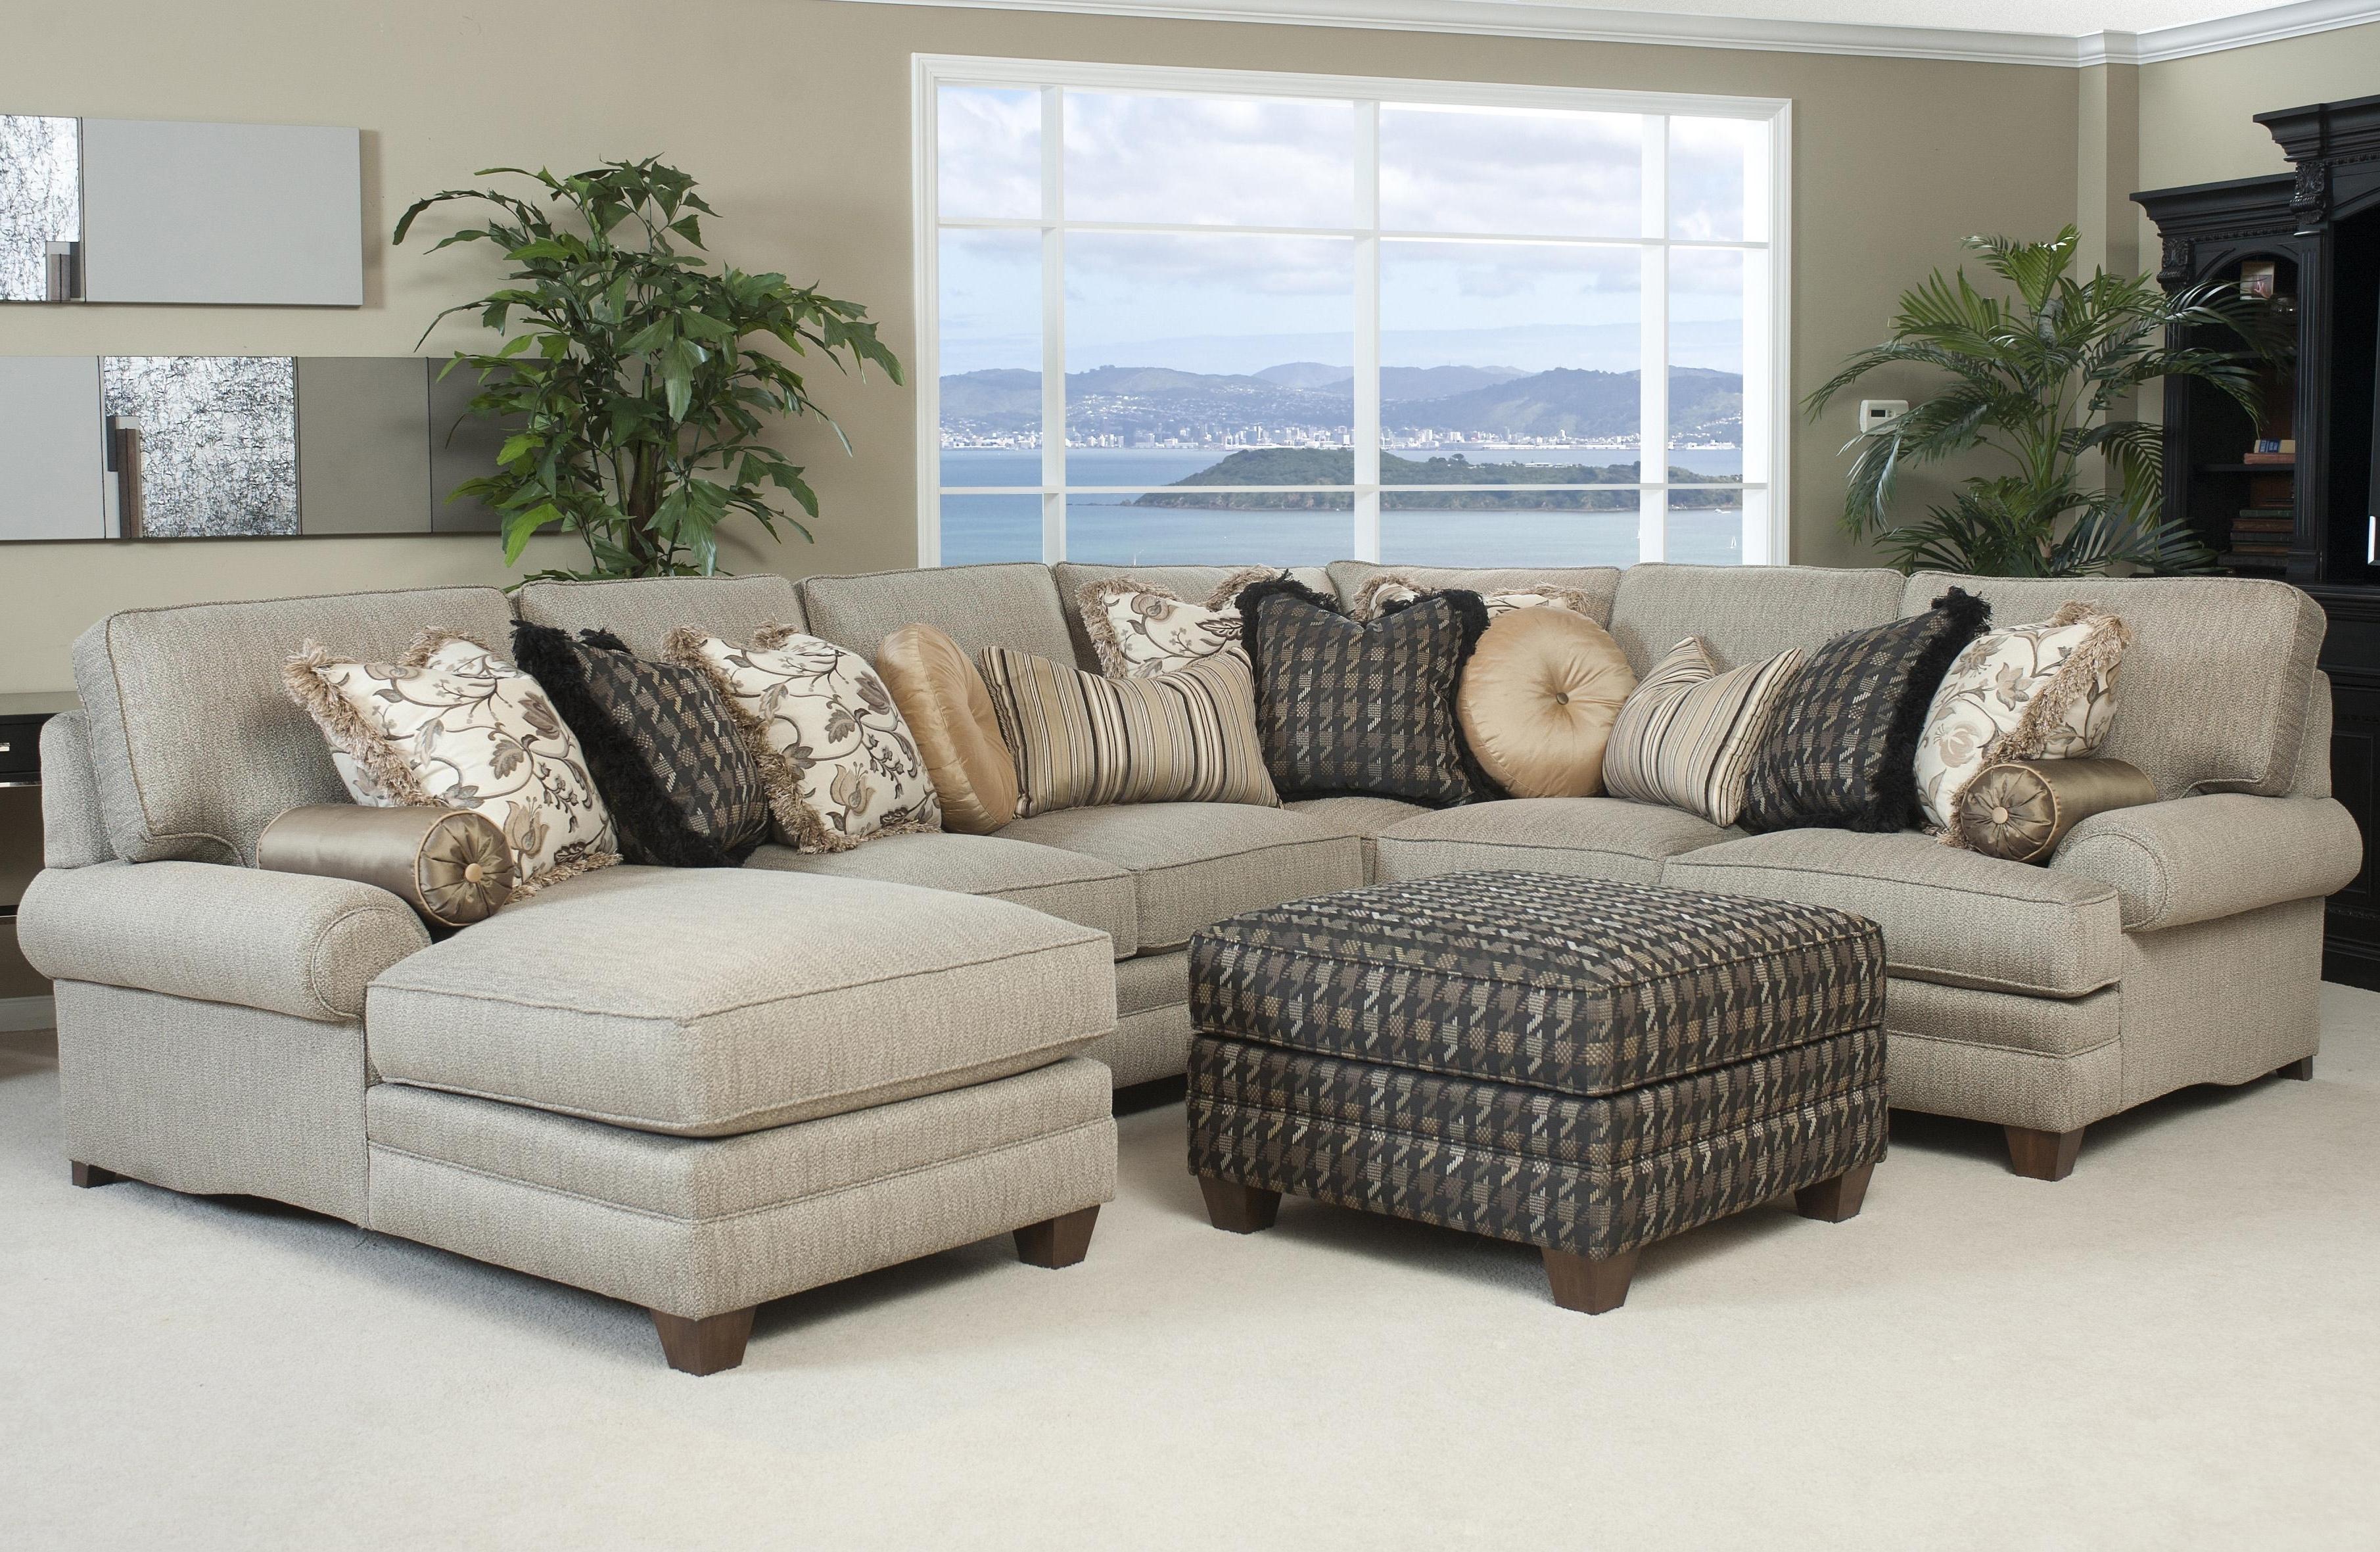 Beige Sectional Sofa